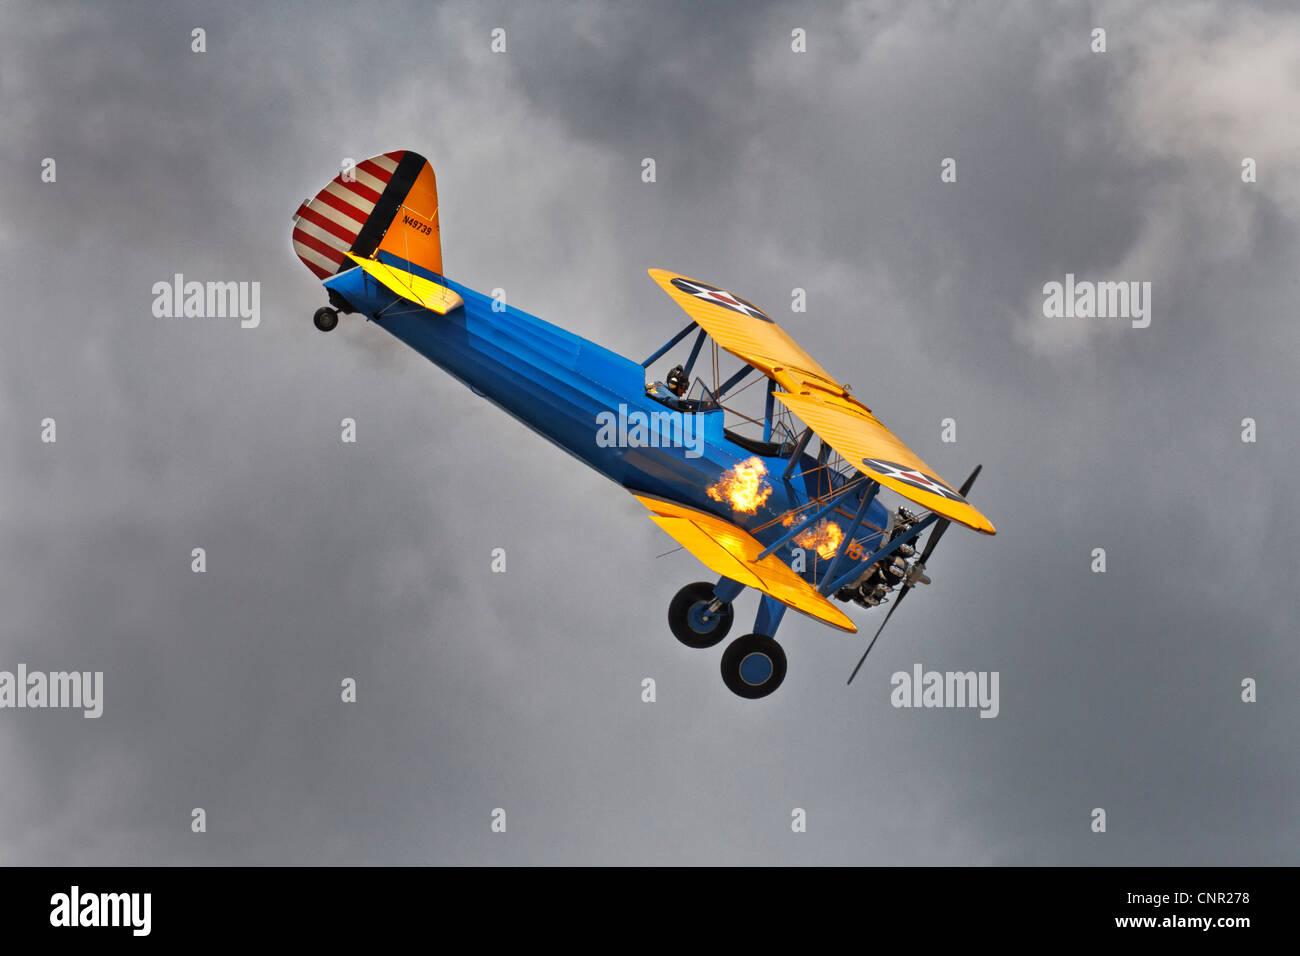 Boeing PT17 Stearman - Stock Image